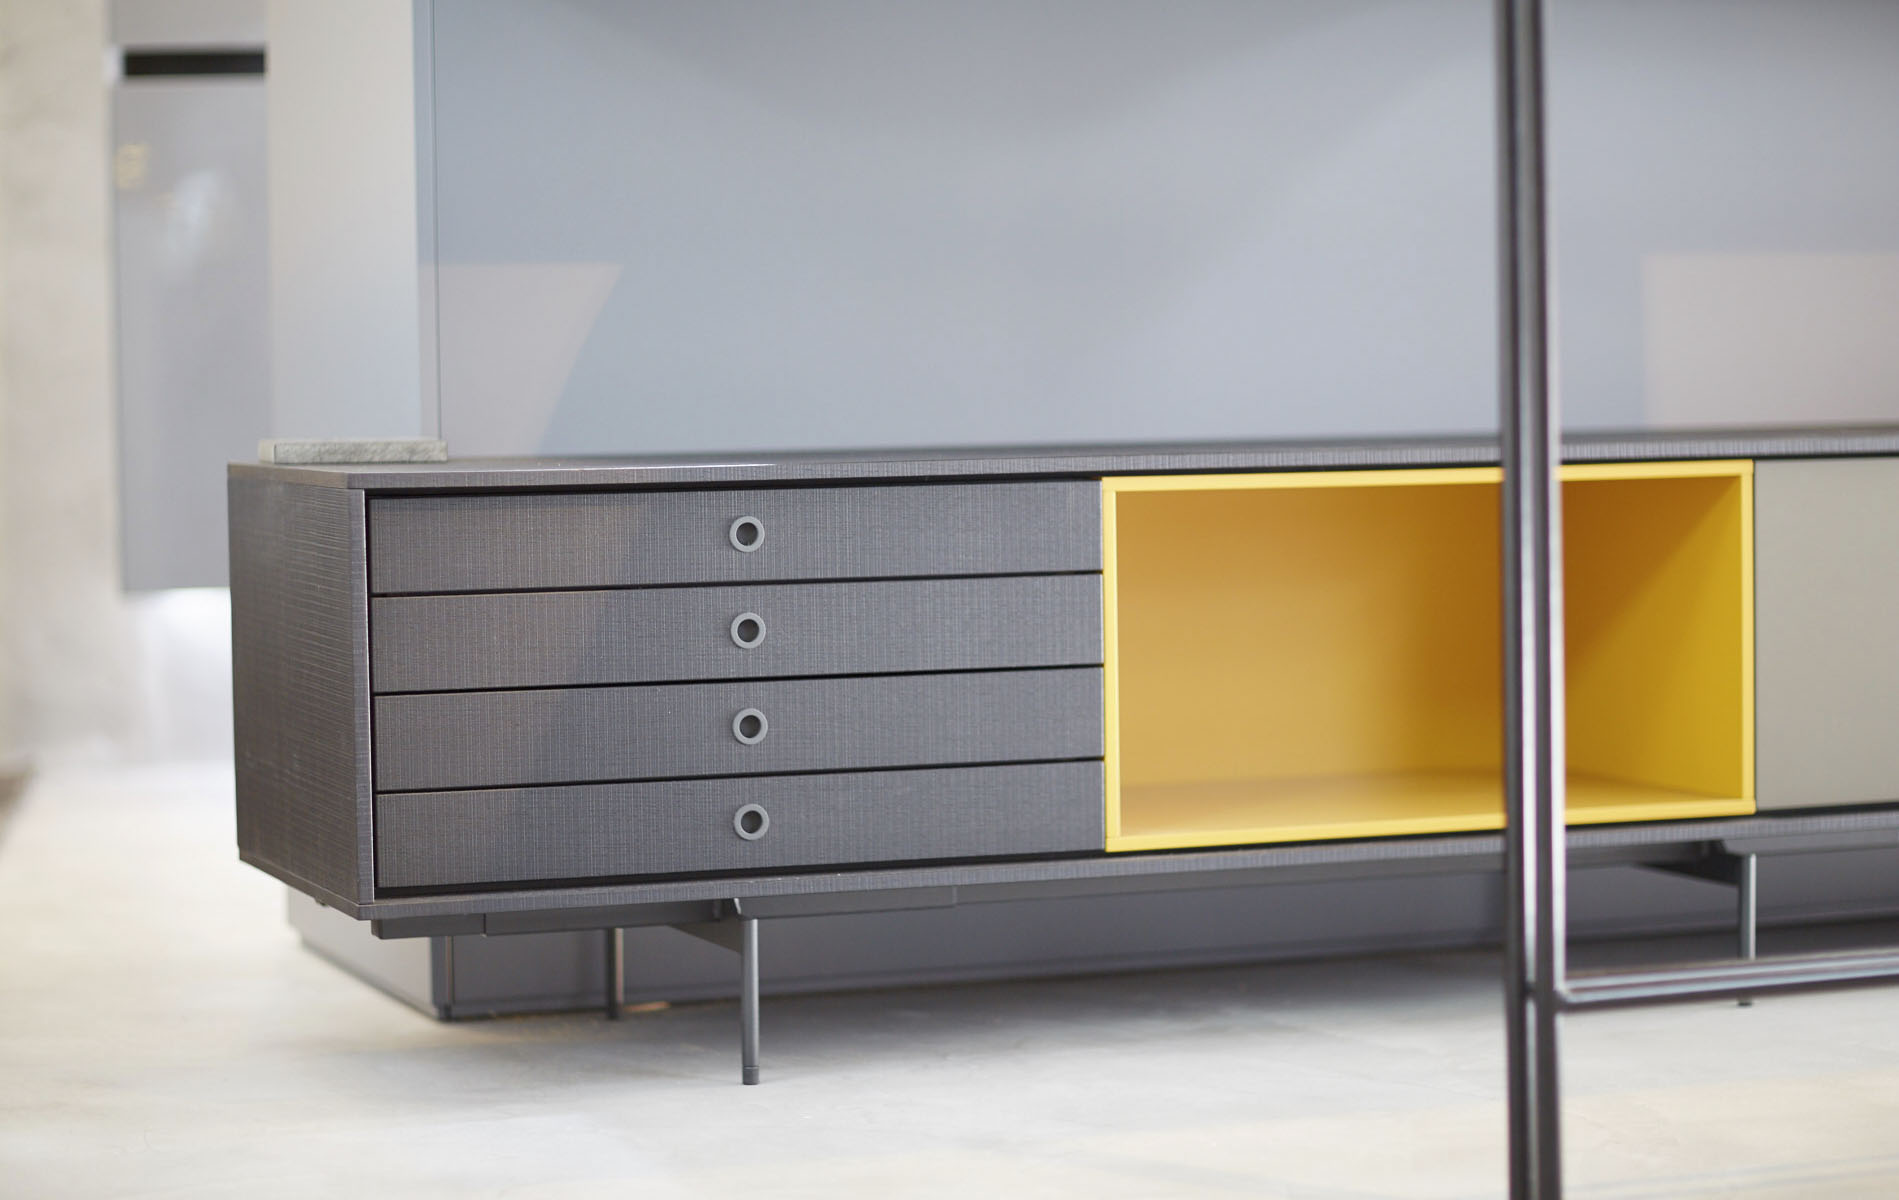 muebles butragueno obtenga ideas dise o de muebles para